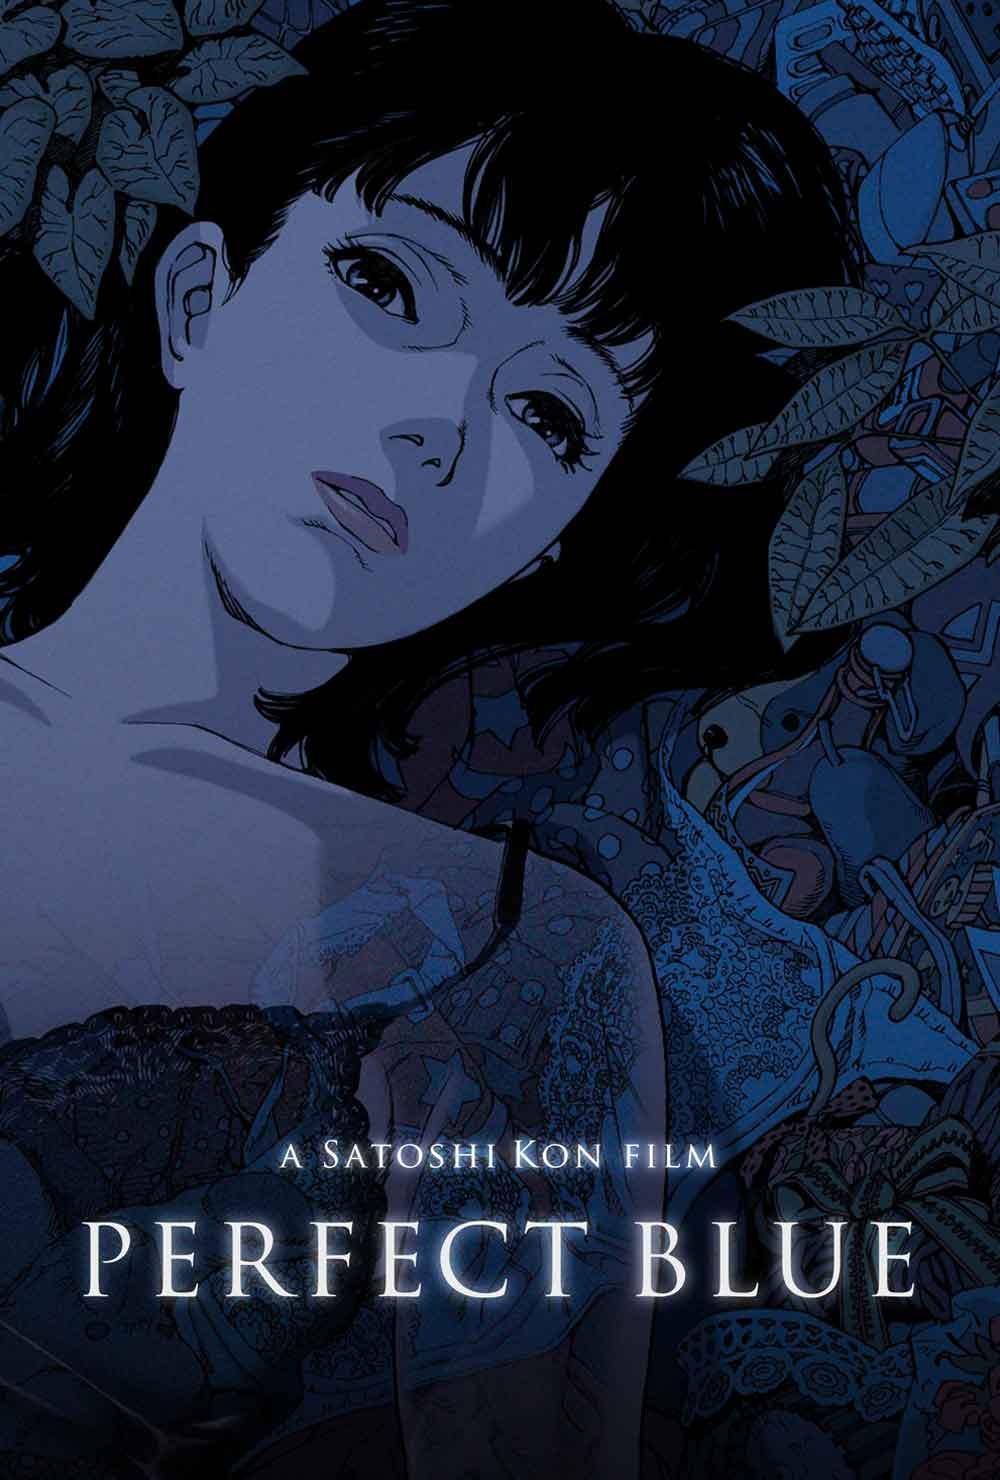 Perfect Blue (1997) - IMDb